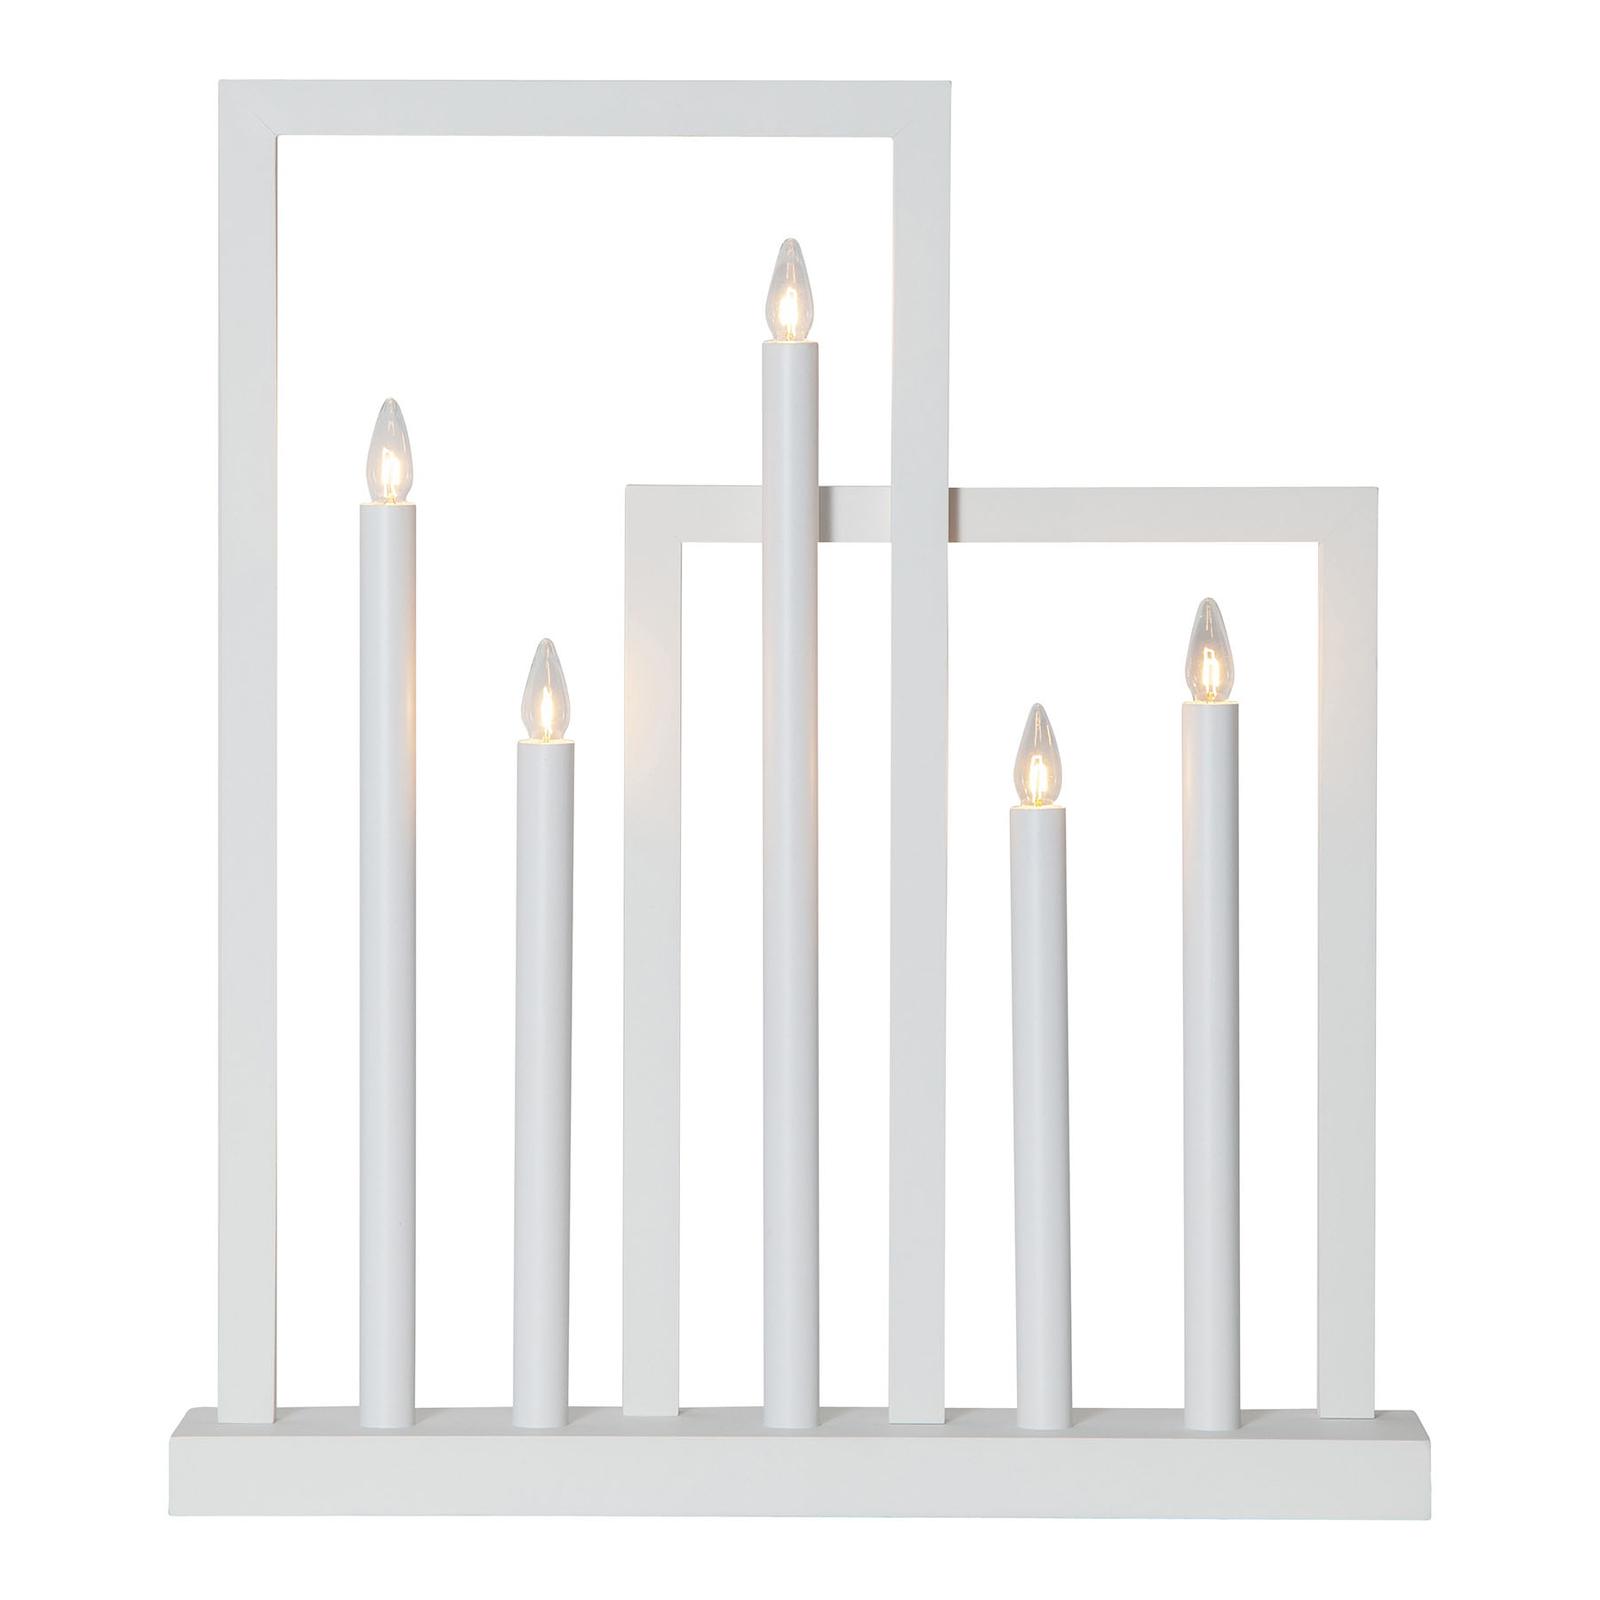 Fensterleuchter Frame aus Holz, 5-flammig